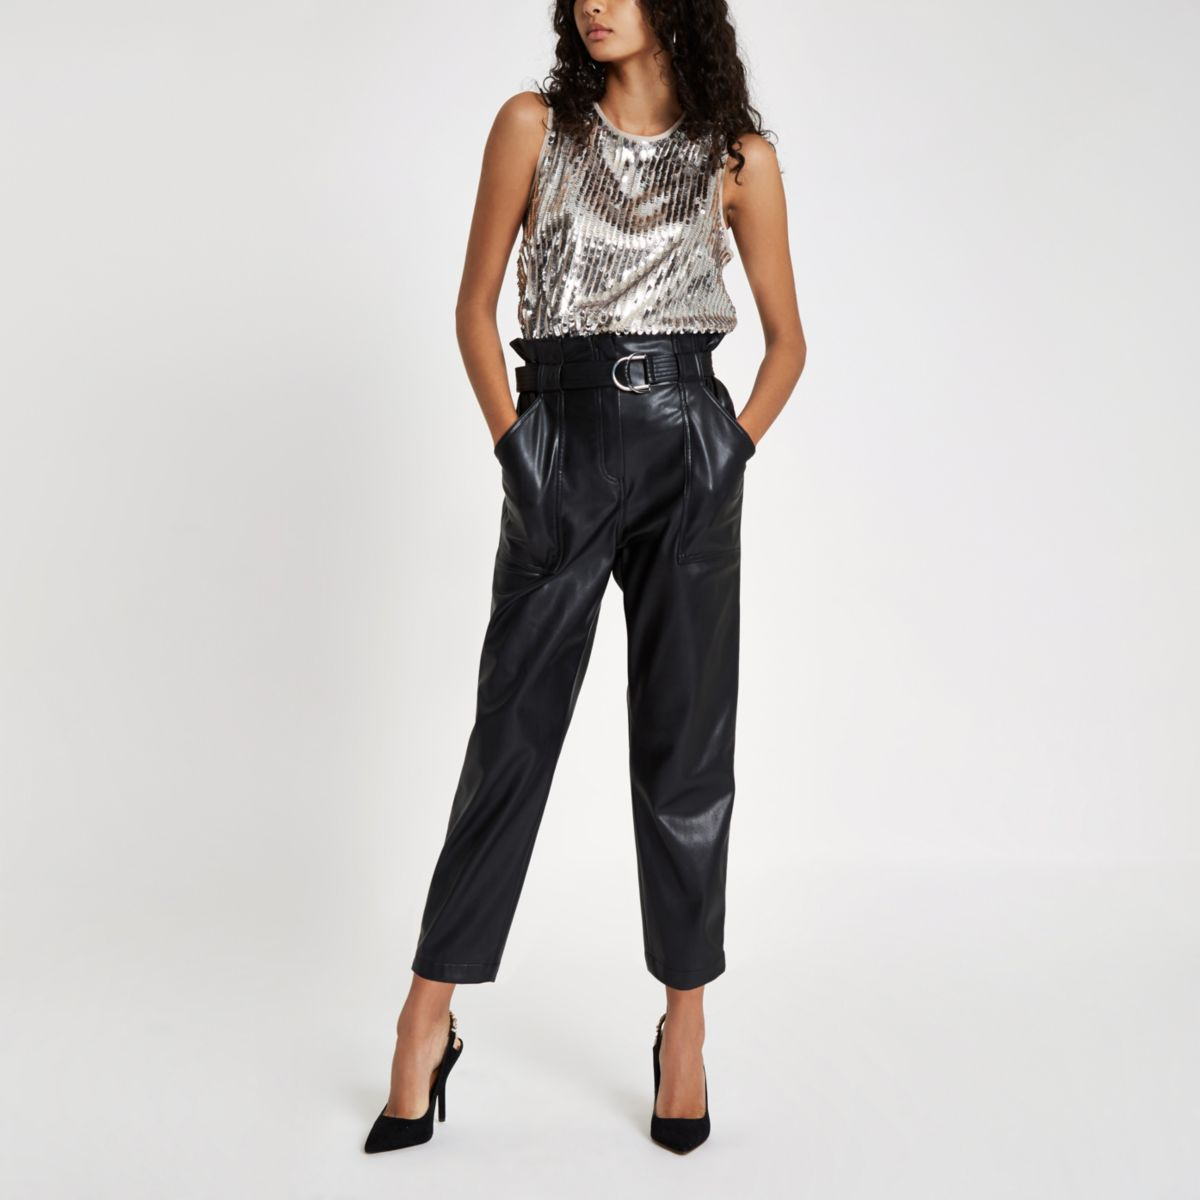 Silver sequin embellished top